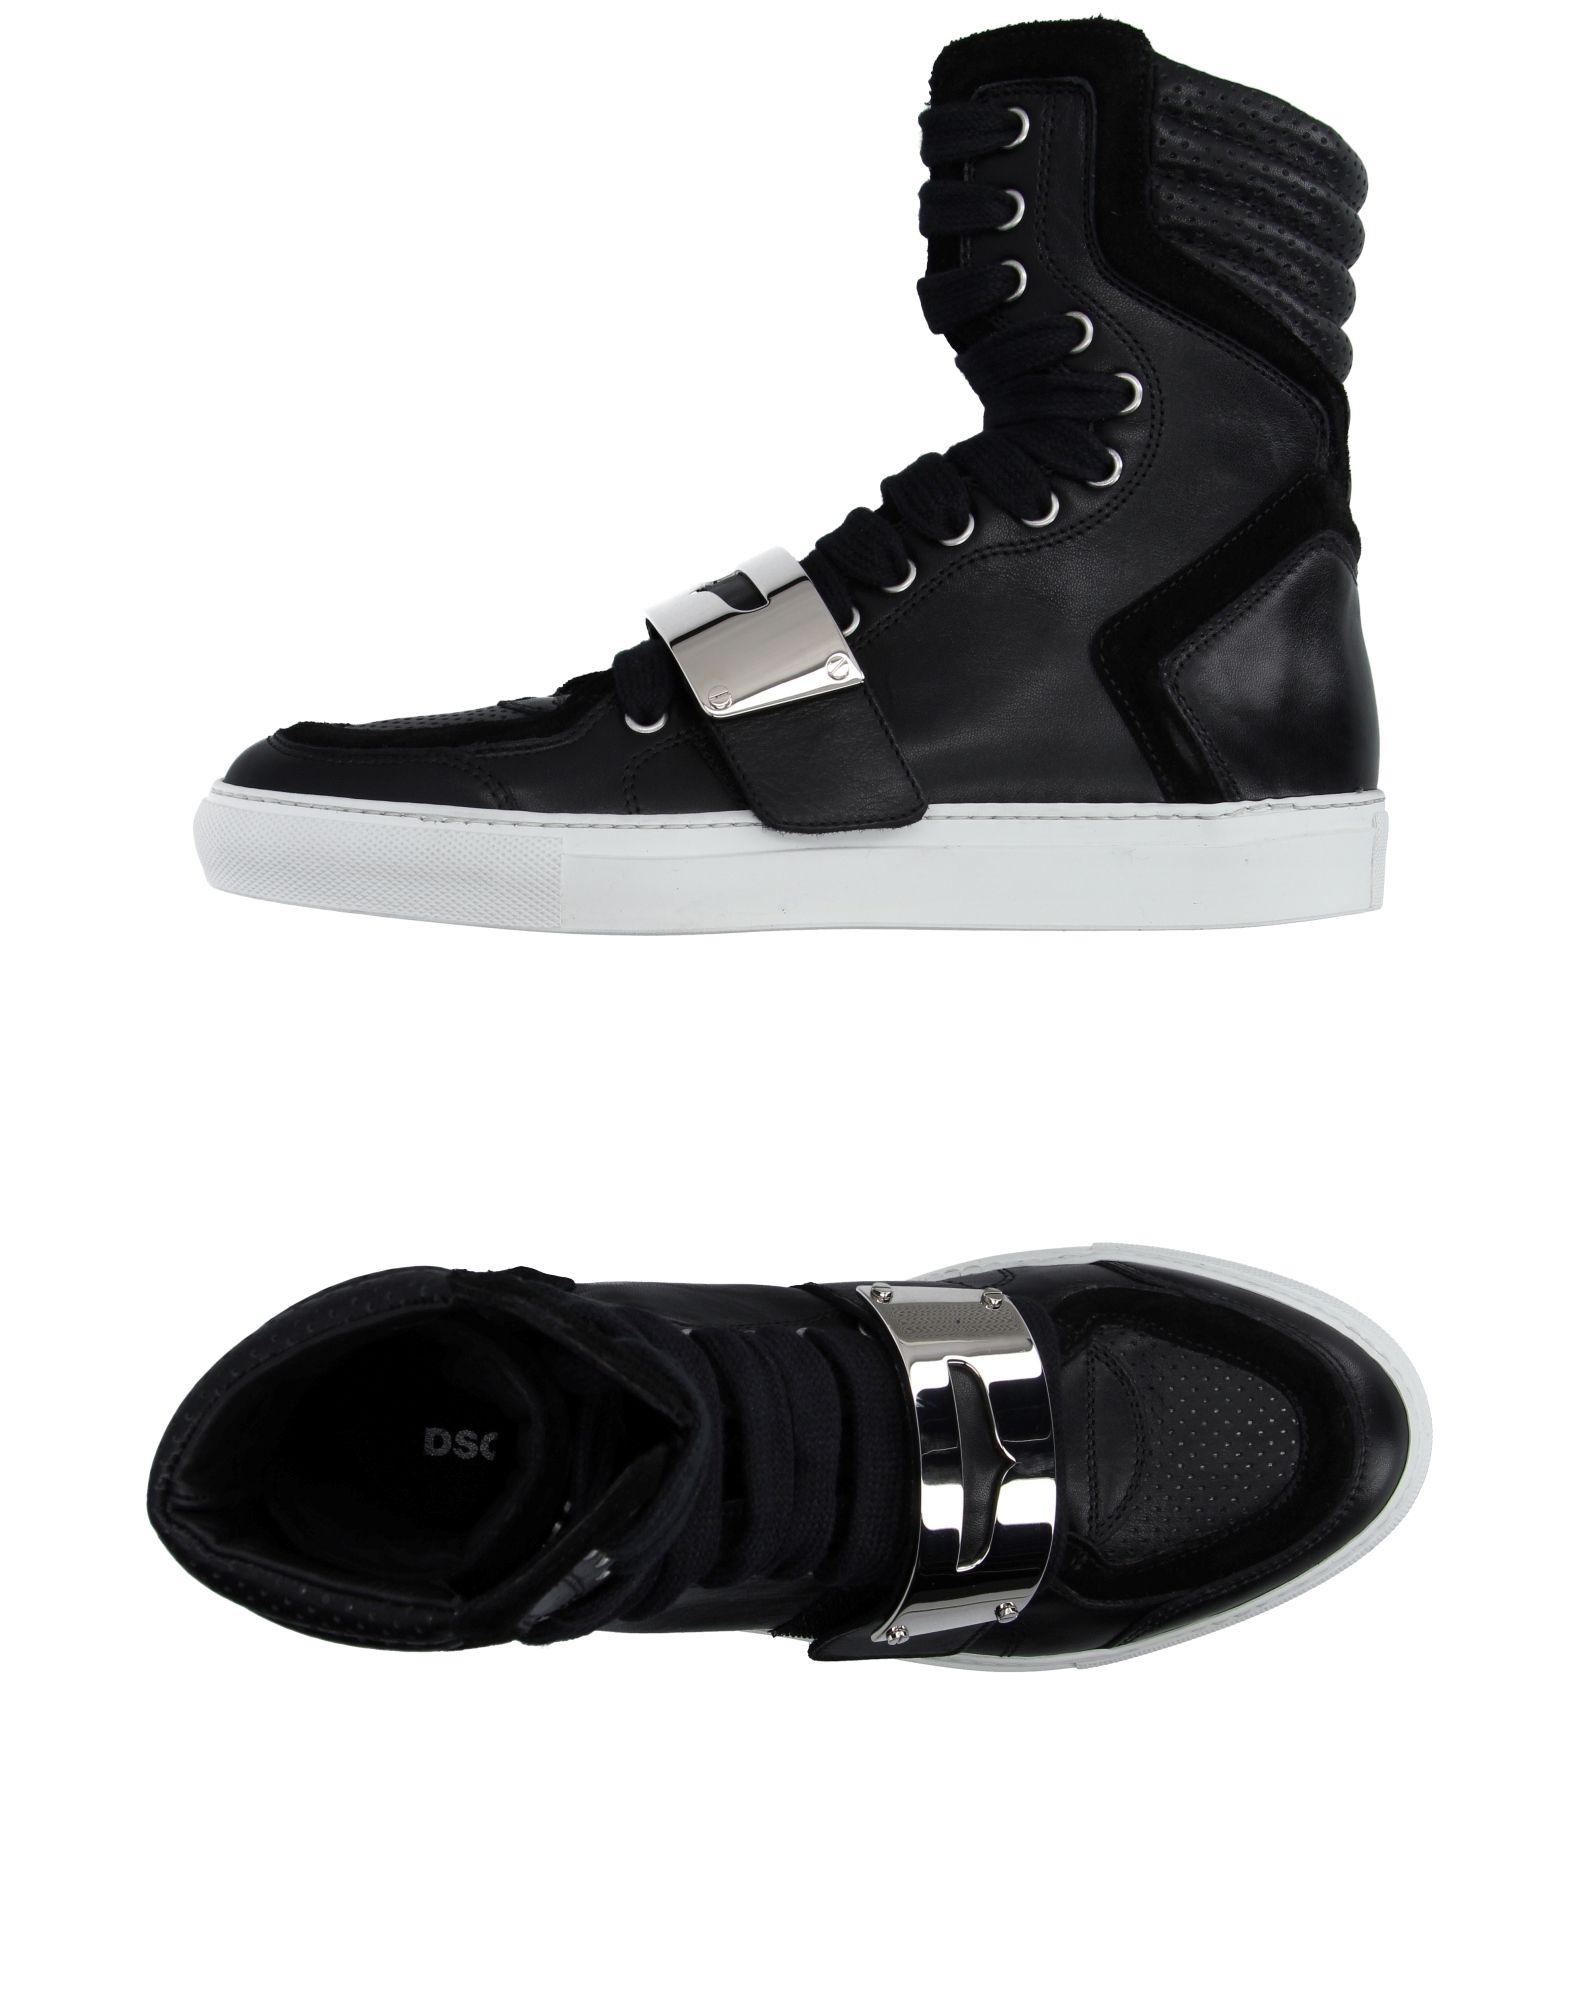 Sneakers noir homme avis